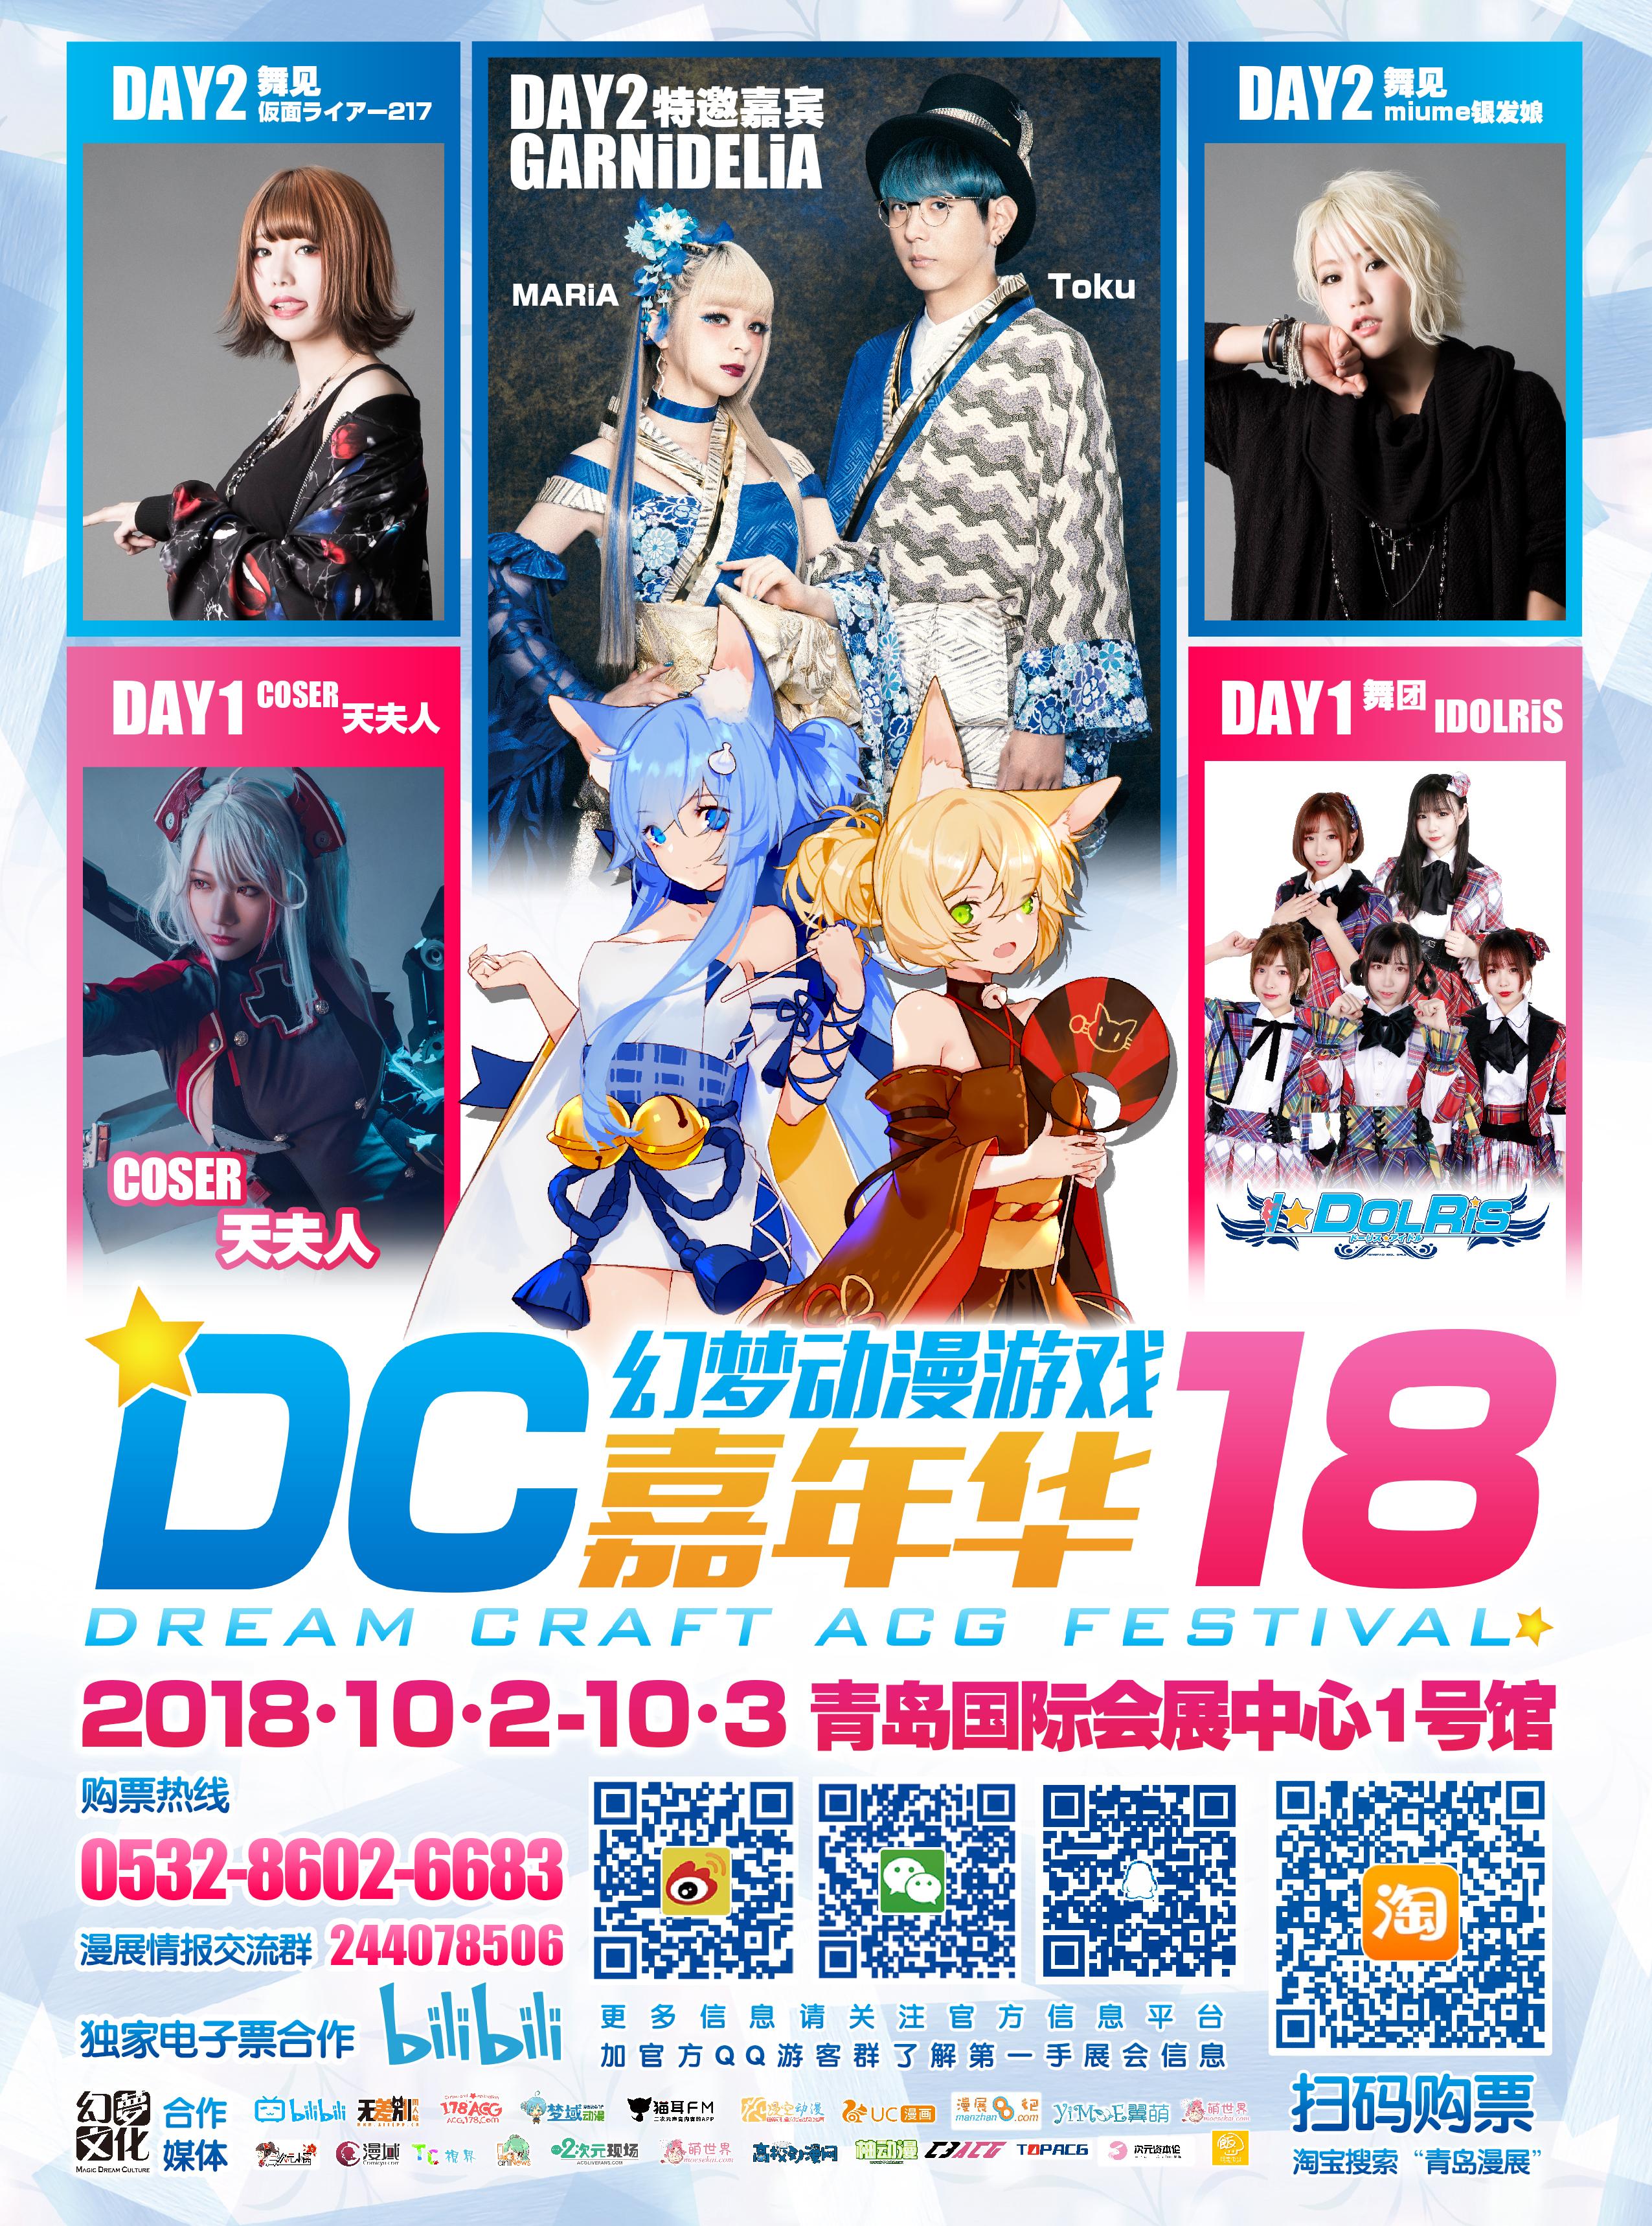 【A4】DC18主海报【高校版】【正面】.jpg